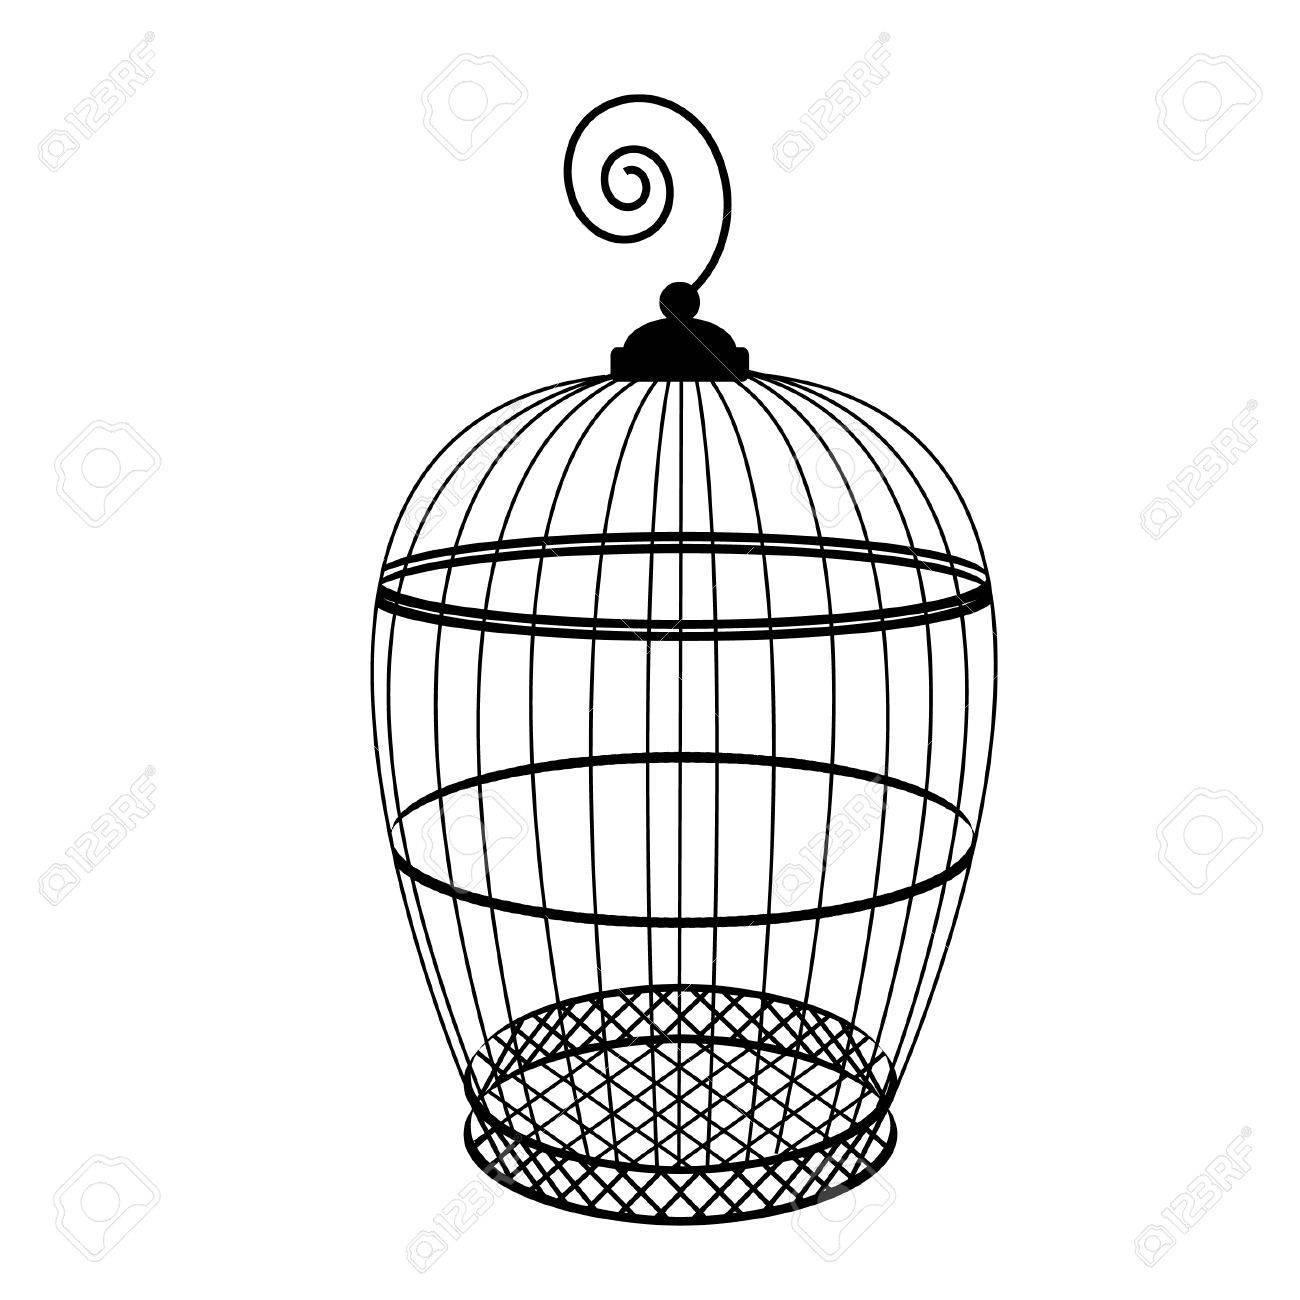 1300x1300 Creative Download Free Vintage Bird Cage Clip Art Image Free